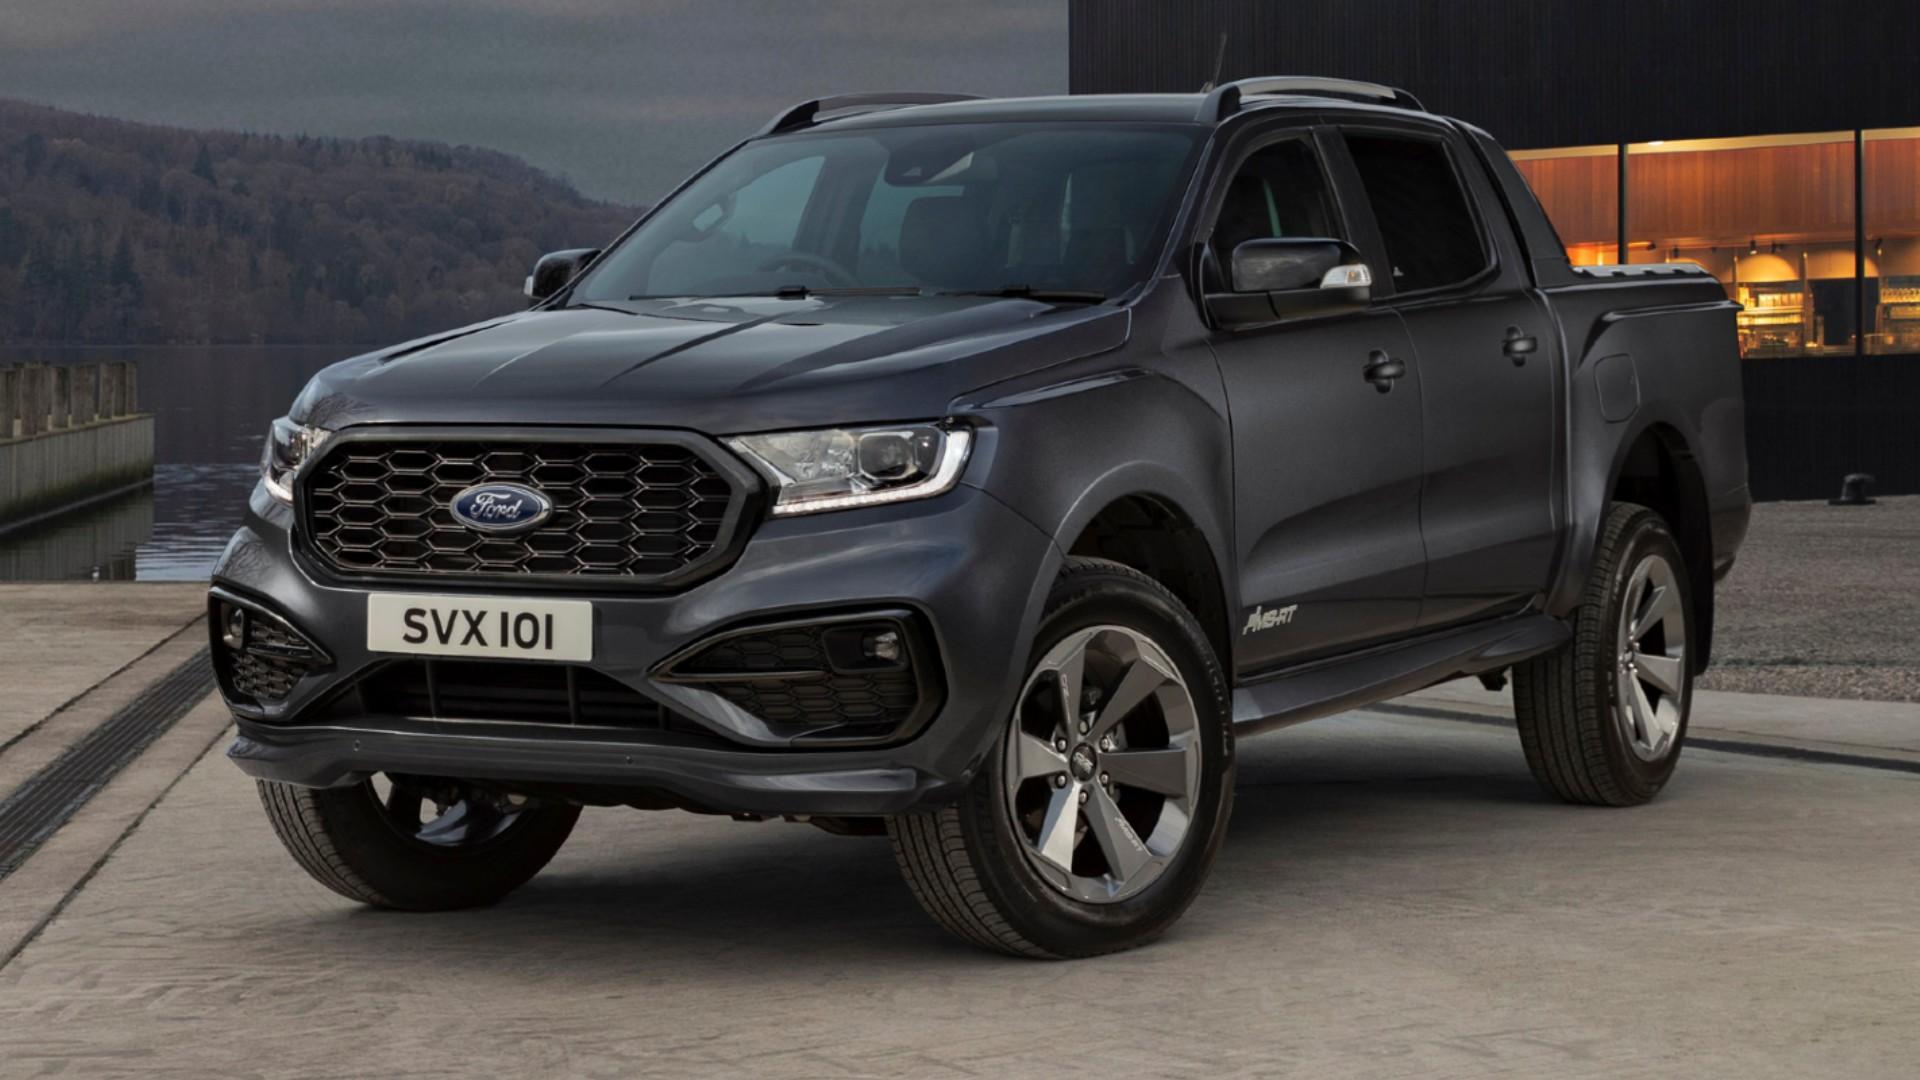 Ford Ranger MS-RT: Νέα έκδοση με σπορ εμφάνιση [vid]